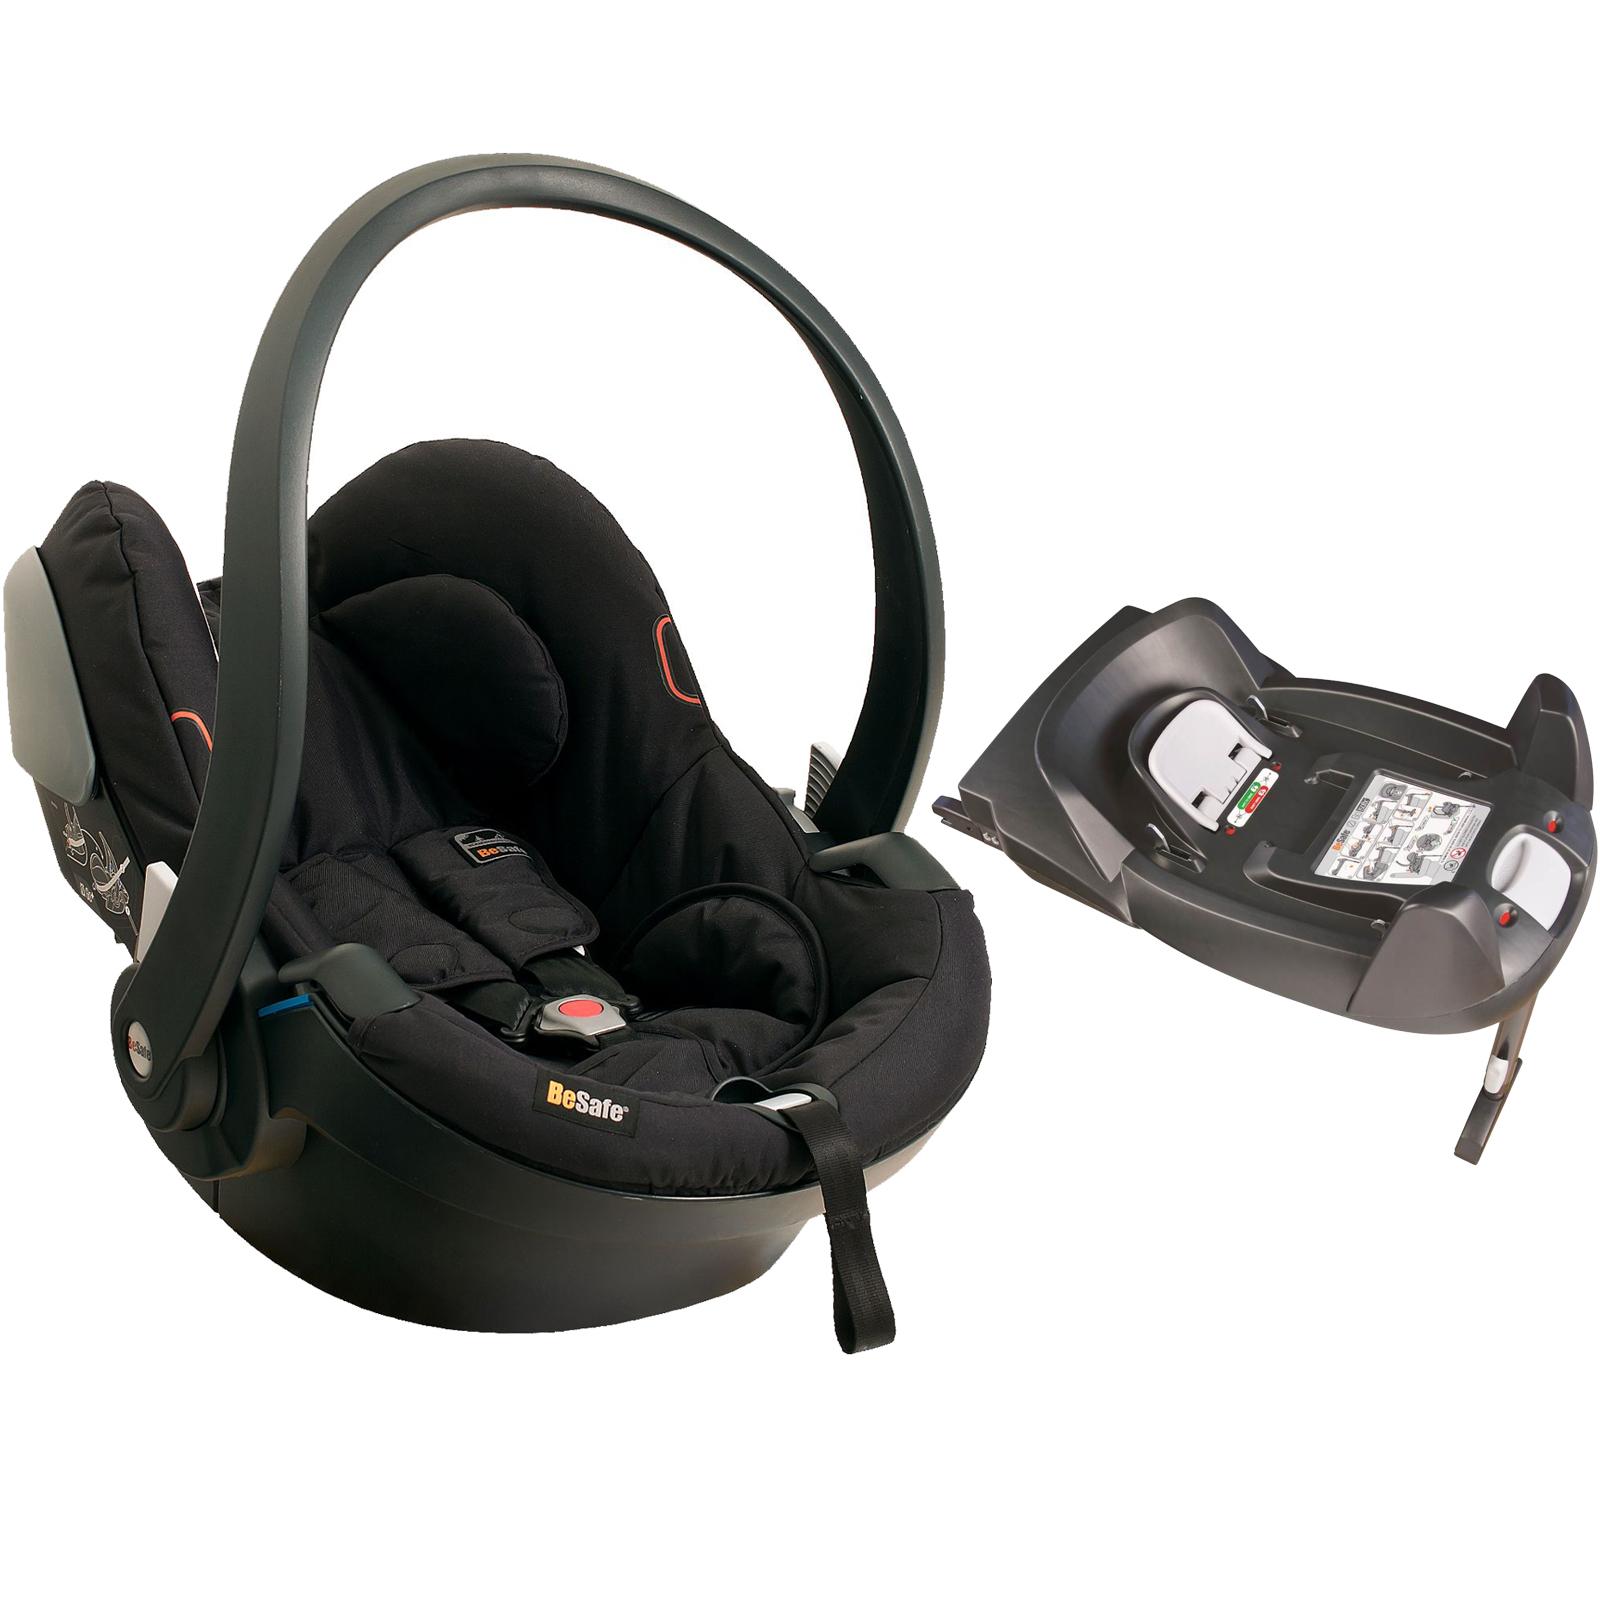 besafe izi go x1 group 0 car seat isofix safety base. Black Bedroom Furniture Sets. Home Design Ideas